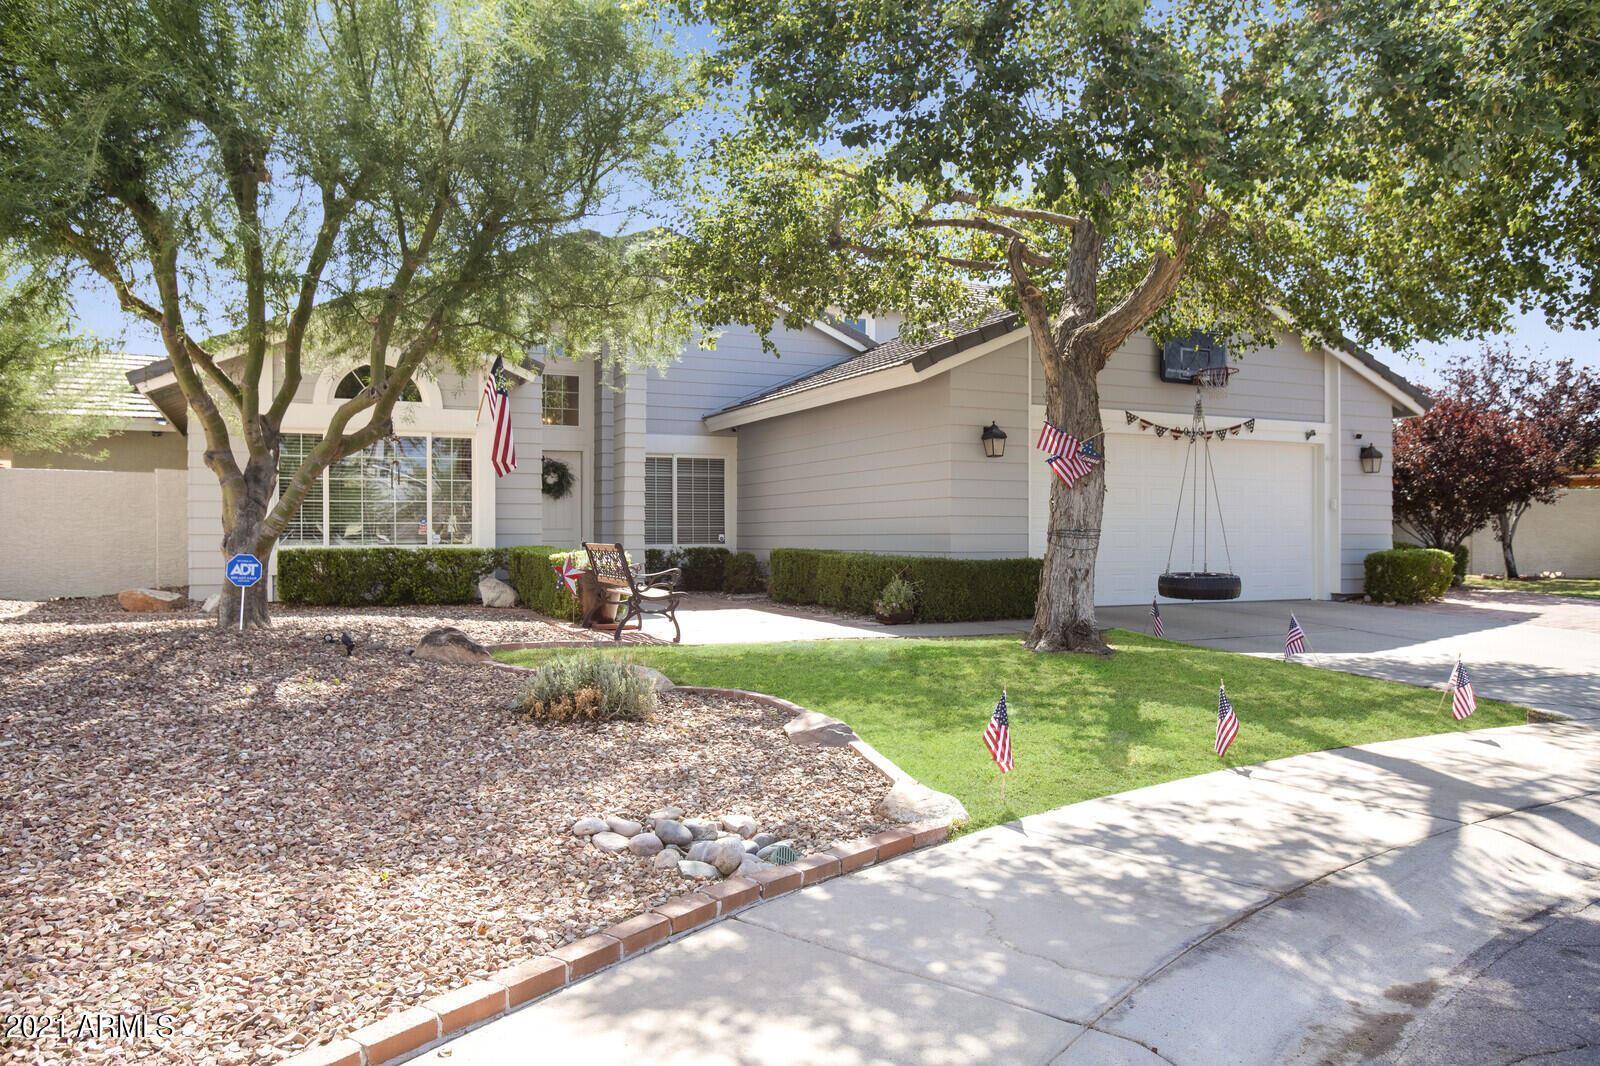 Photo of 9015 E ALTADENA Avenue, Scottsdale, AZ 85260 (MLS # 6272729)